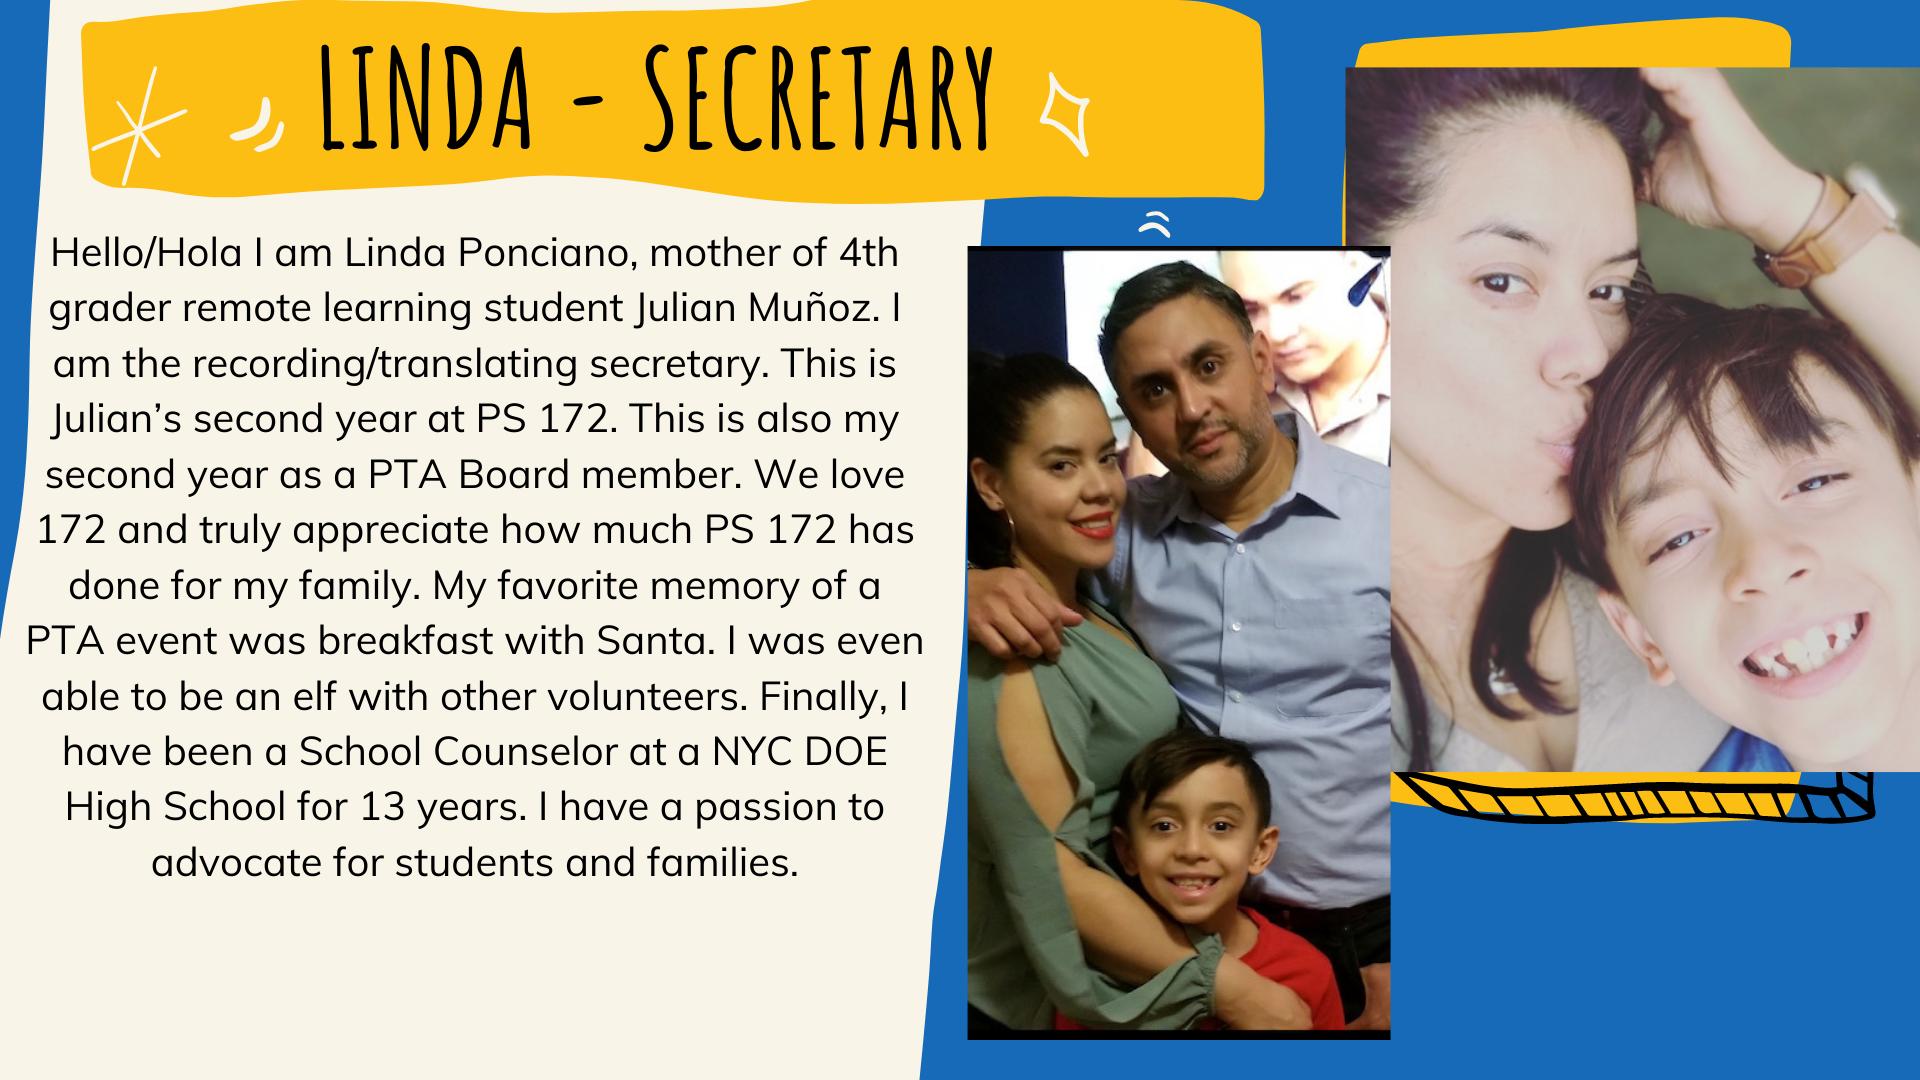 Linda Ponciano - Secretary